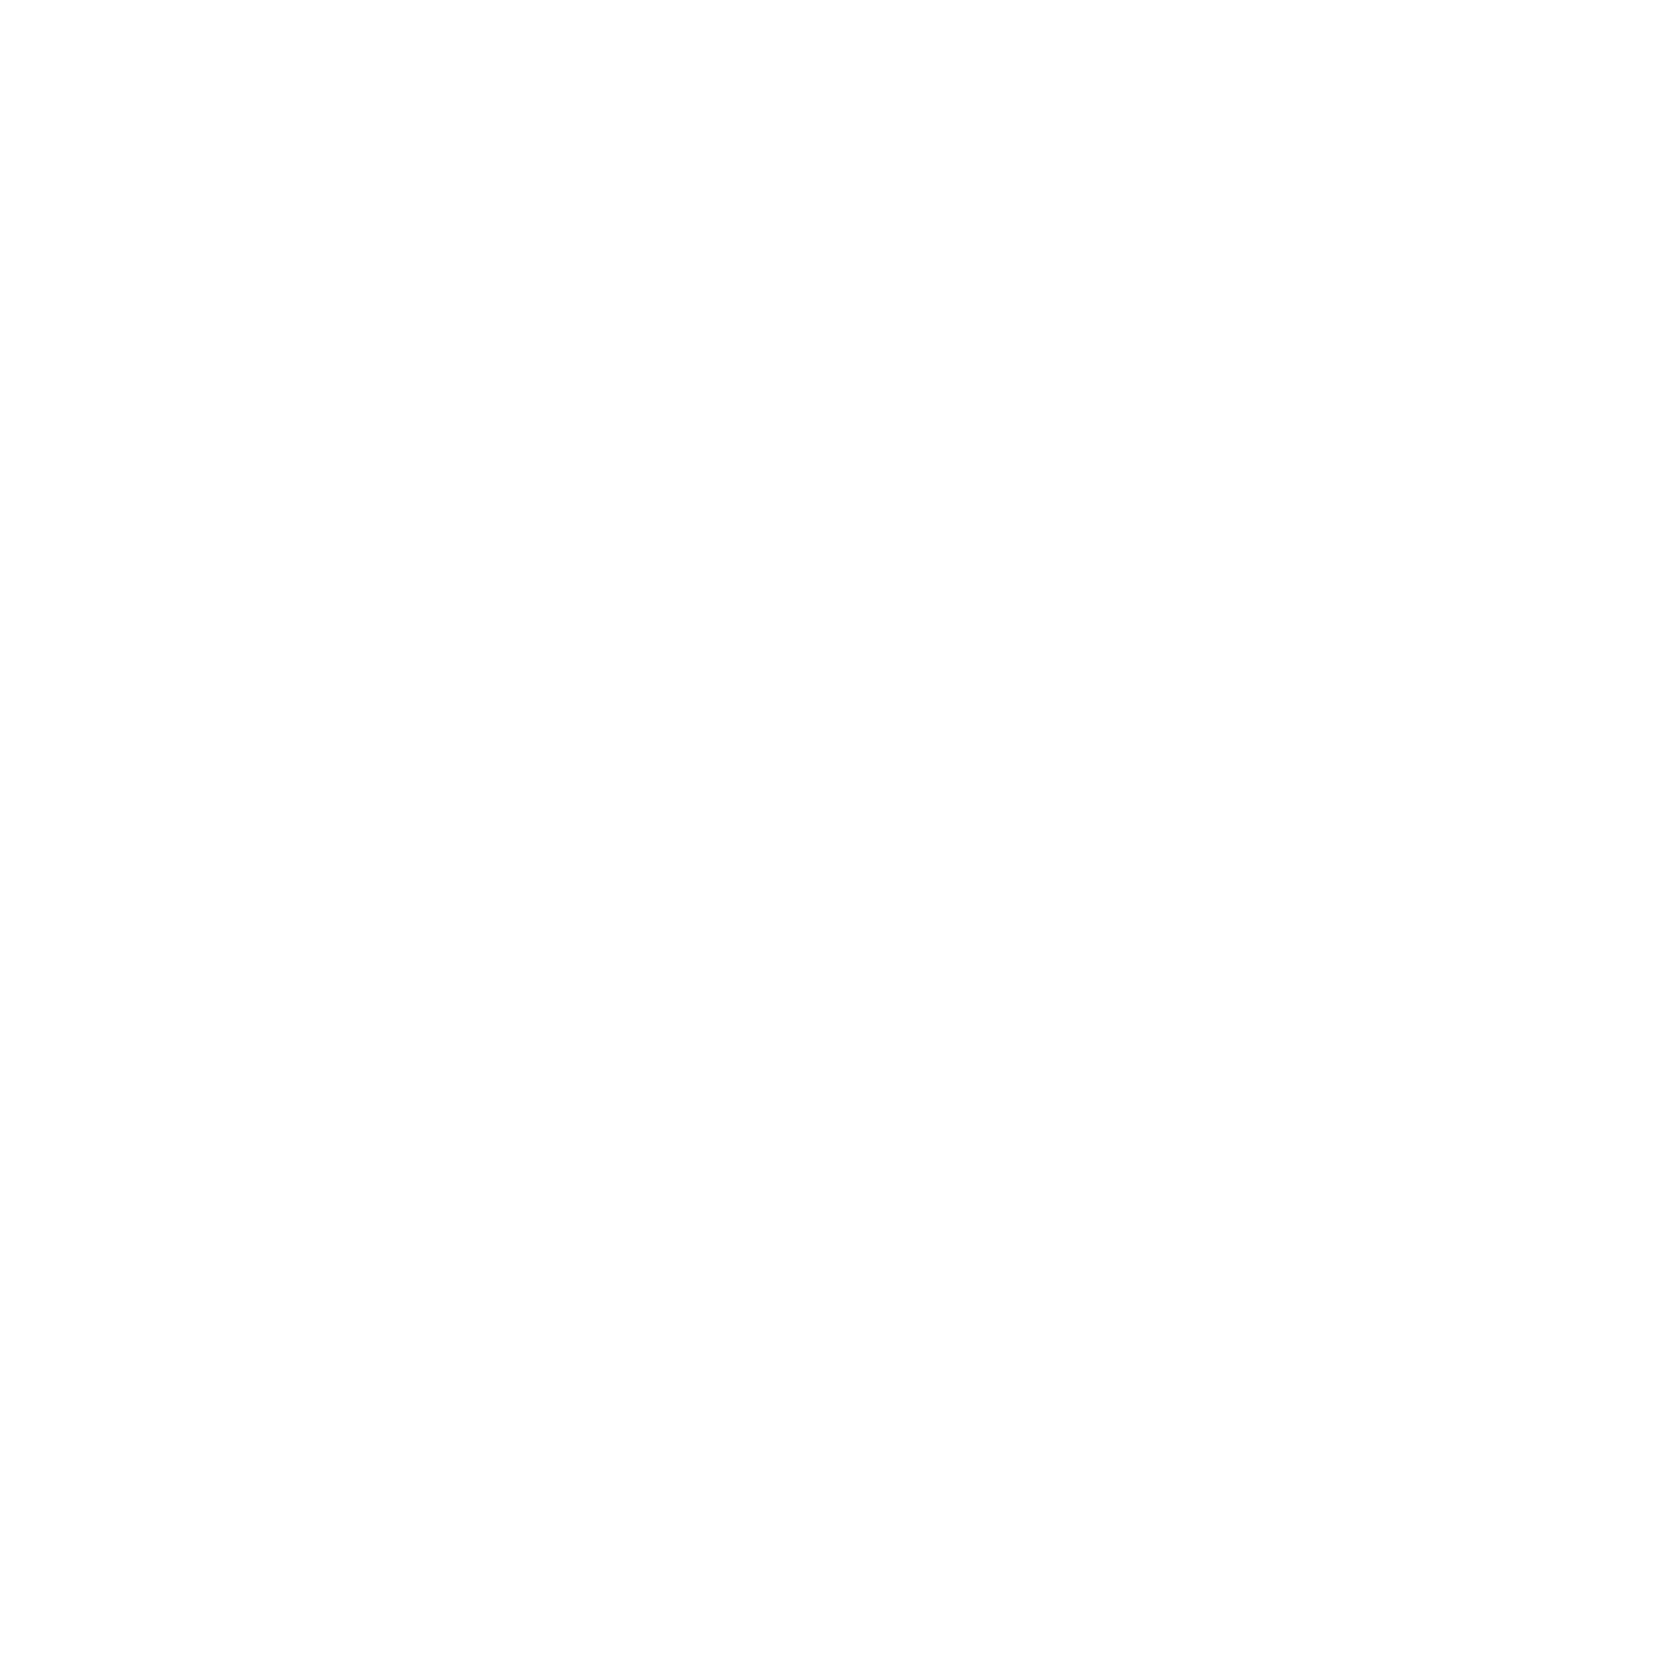 blank400